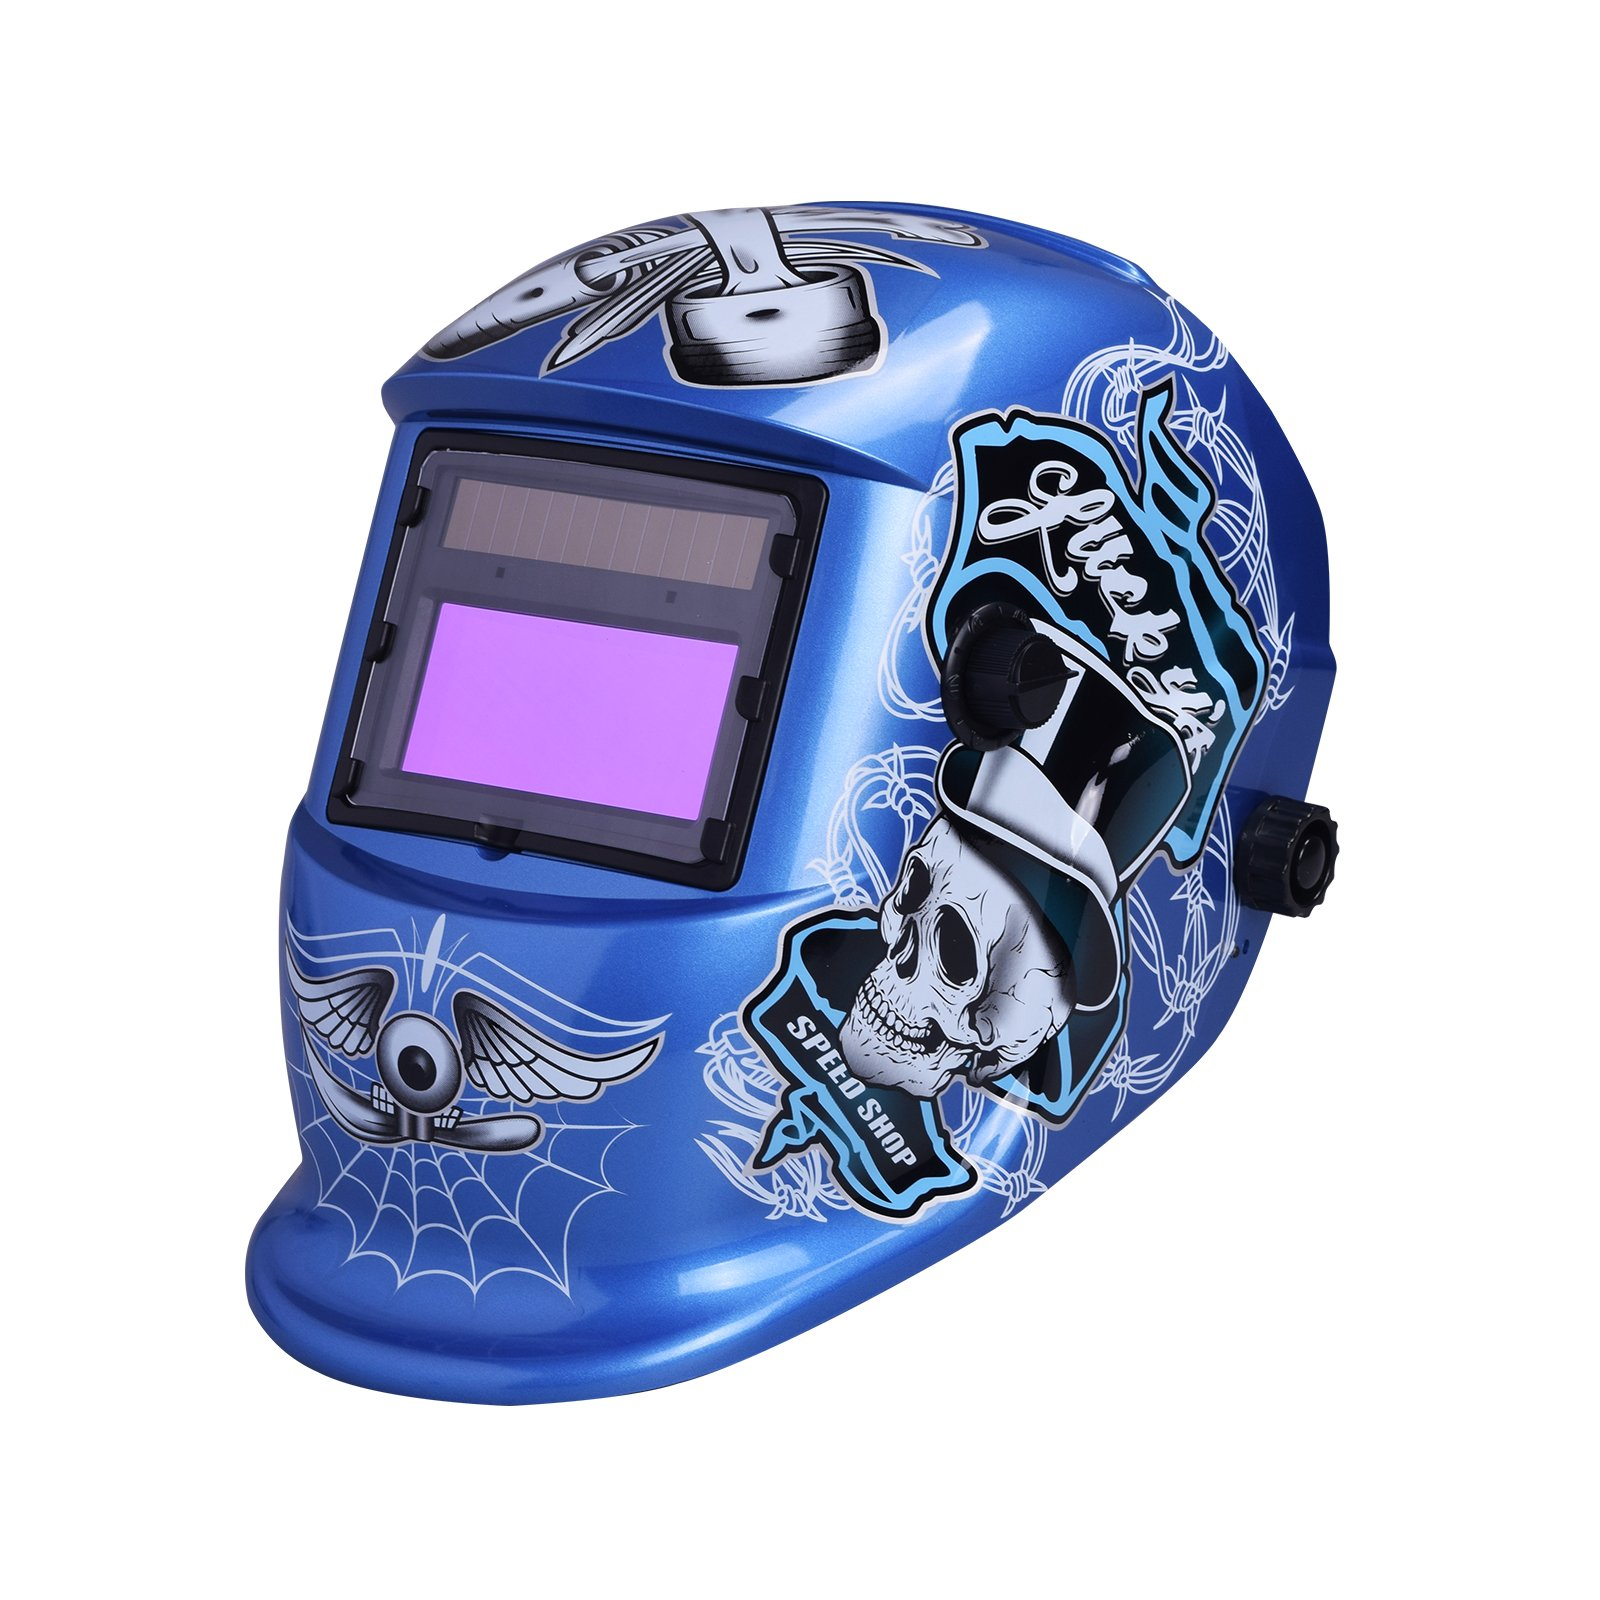 Nuzamas Solar Powered Auto Darkening Welding Helmet Mask Weld Face Protection for Arc Tig Mig Grinding Plasma Cutting with Adjustable Shade Range DIN4/9-13 UV/IV protection DIN16 Skull Pattern Blue